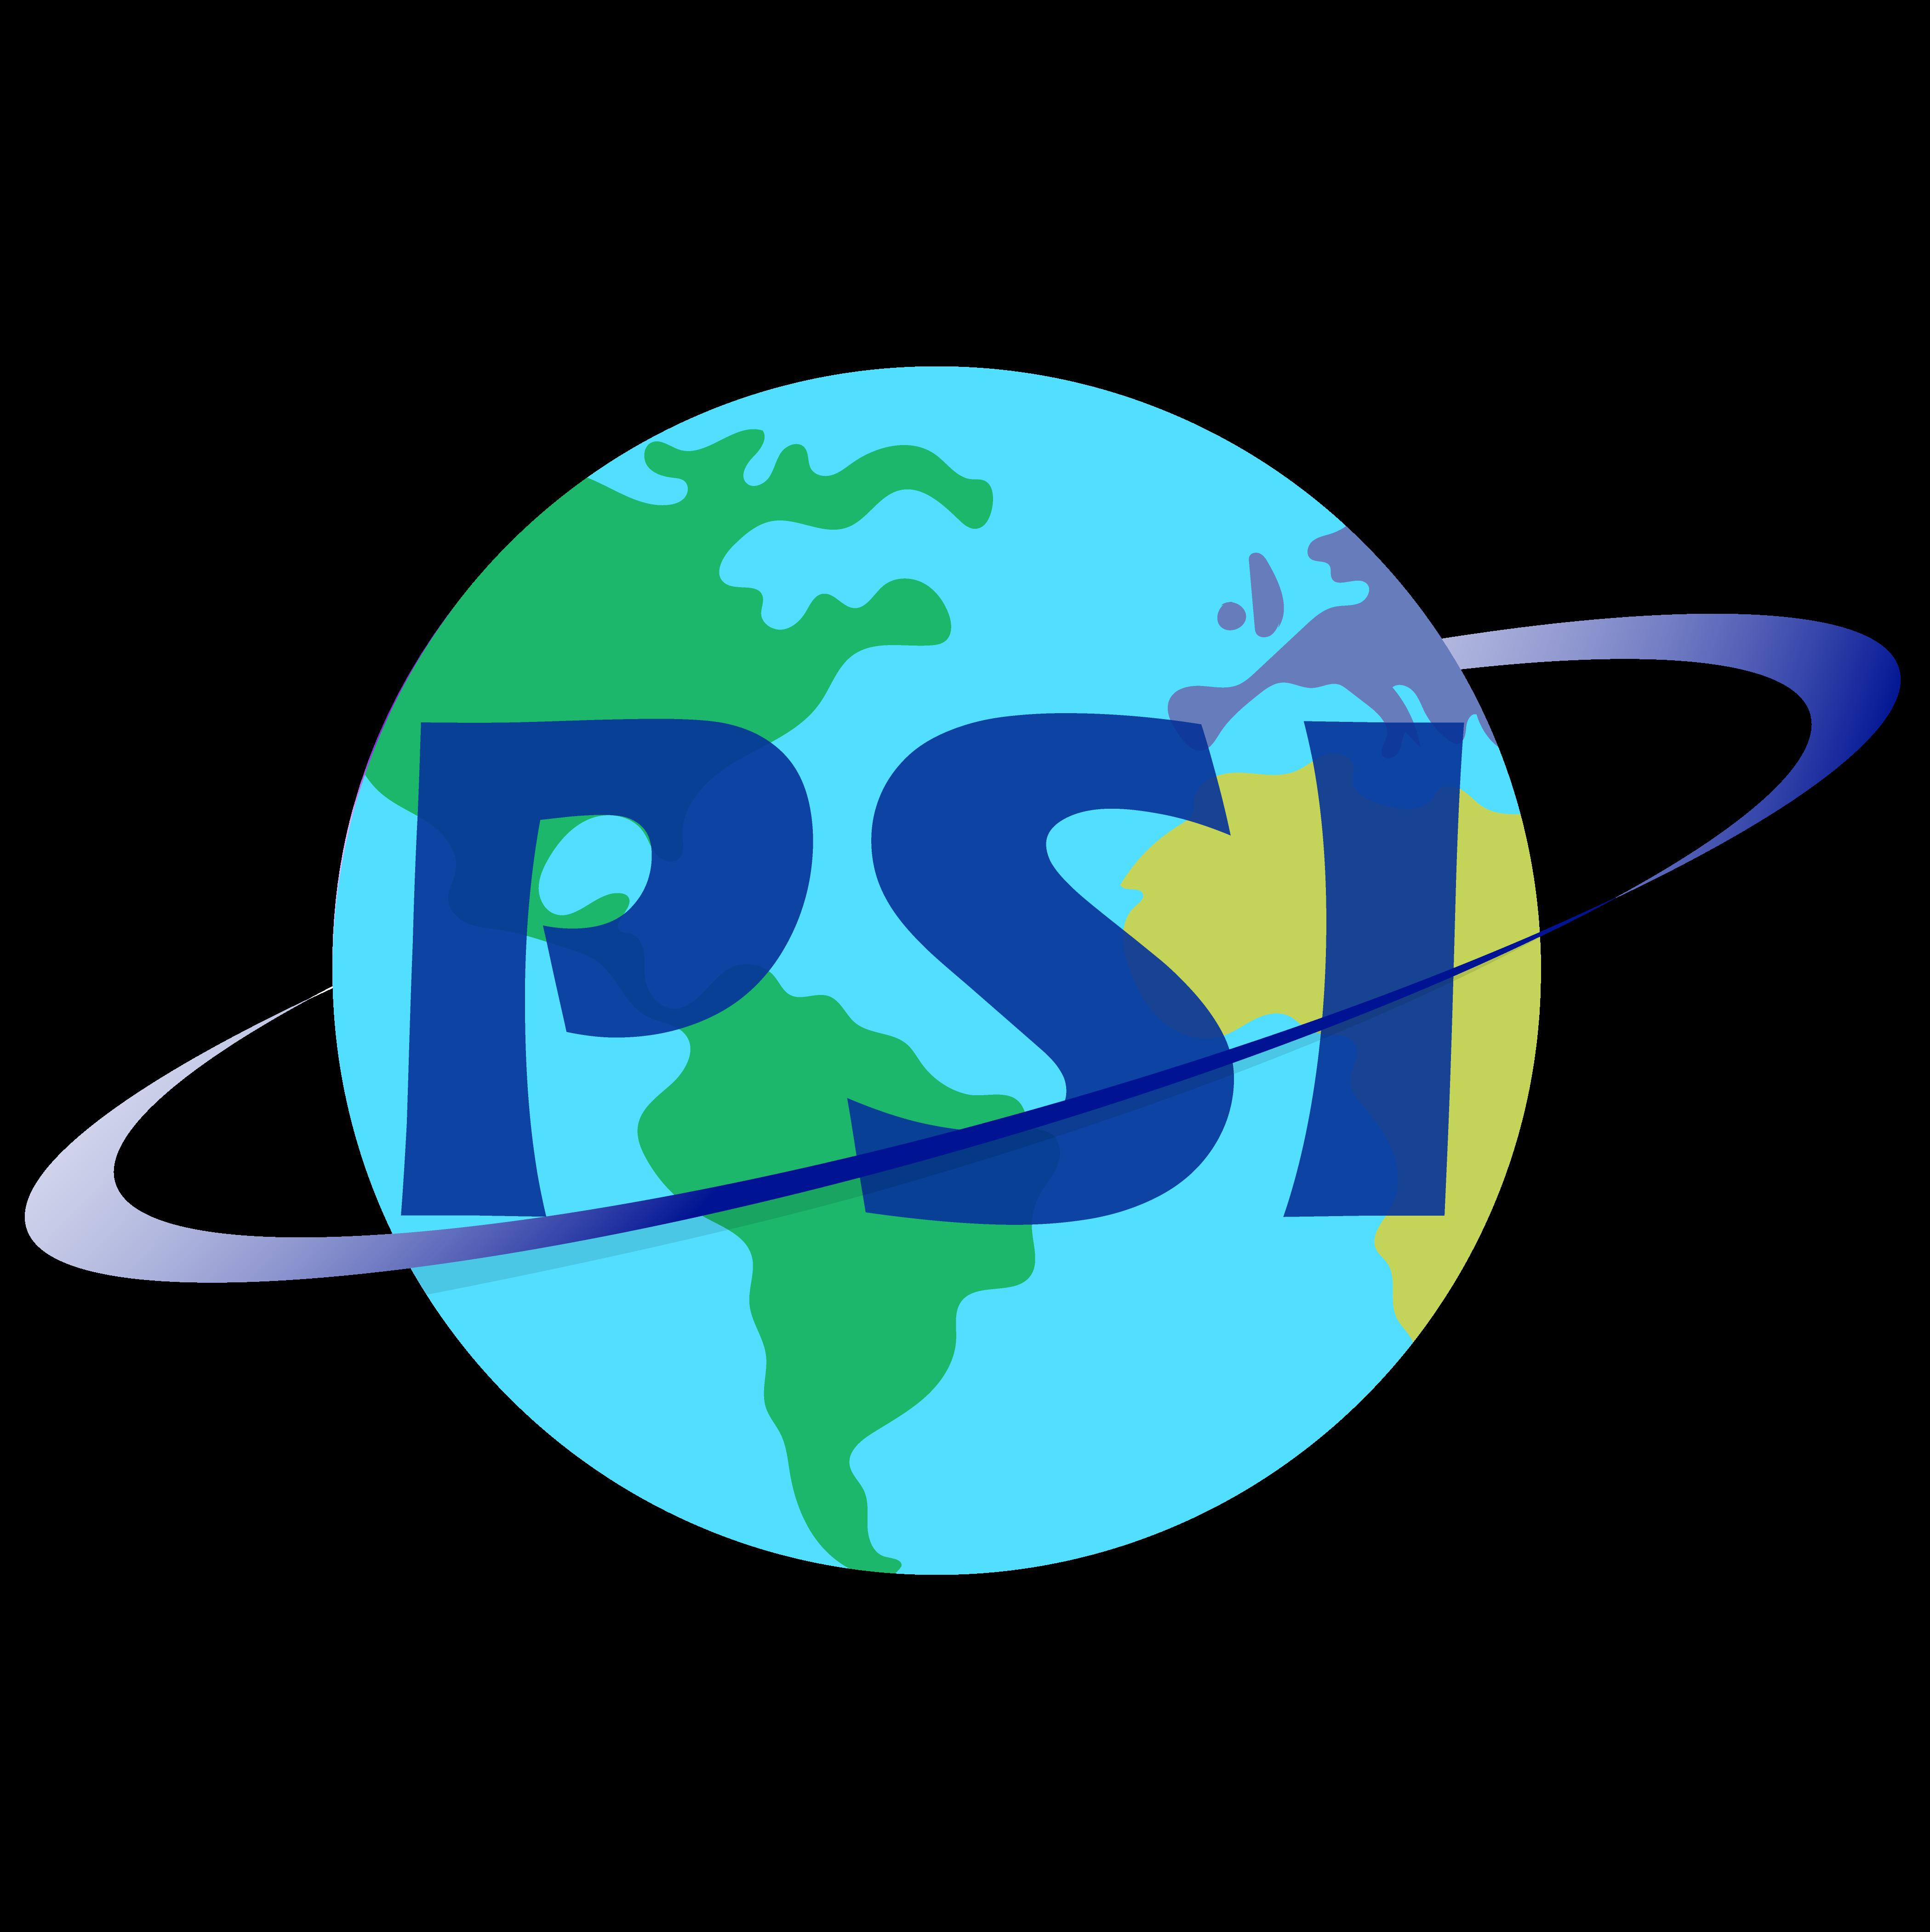 PSI – Serviços de Internet